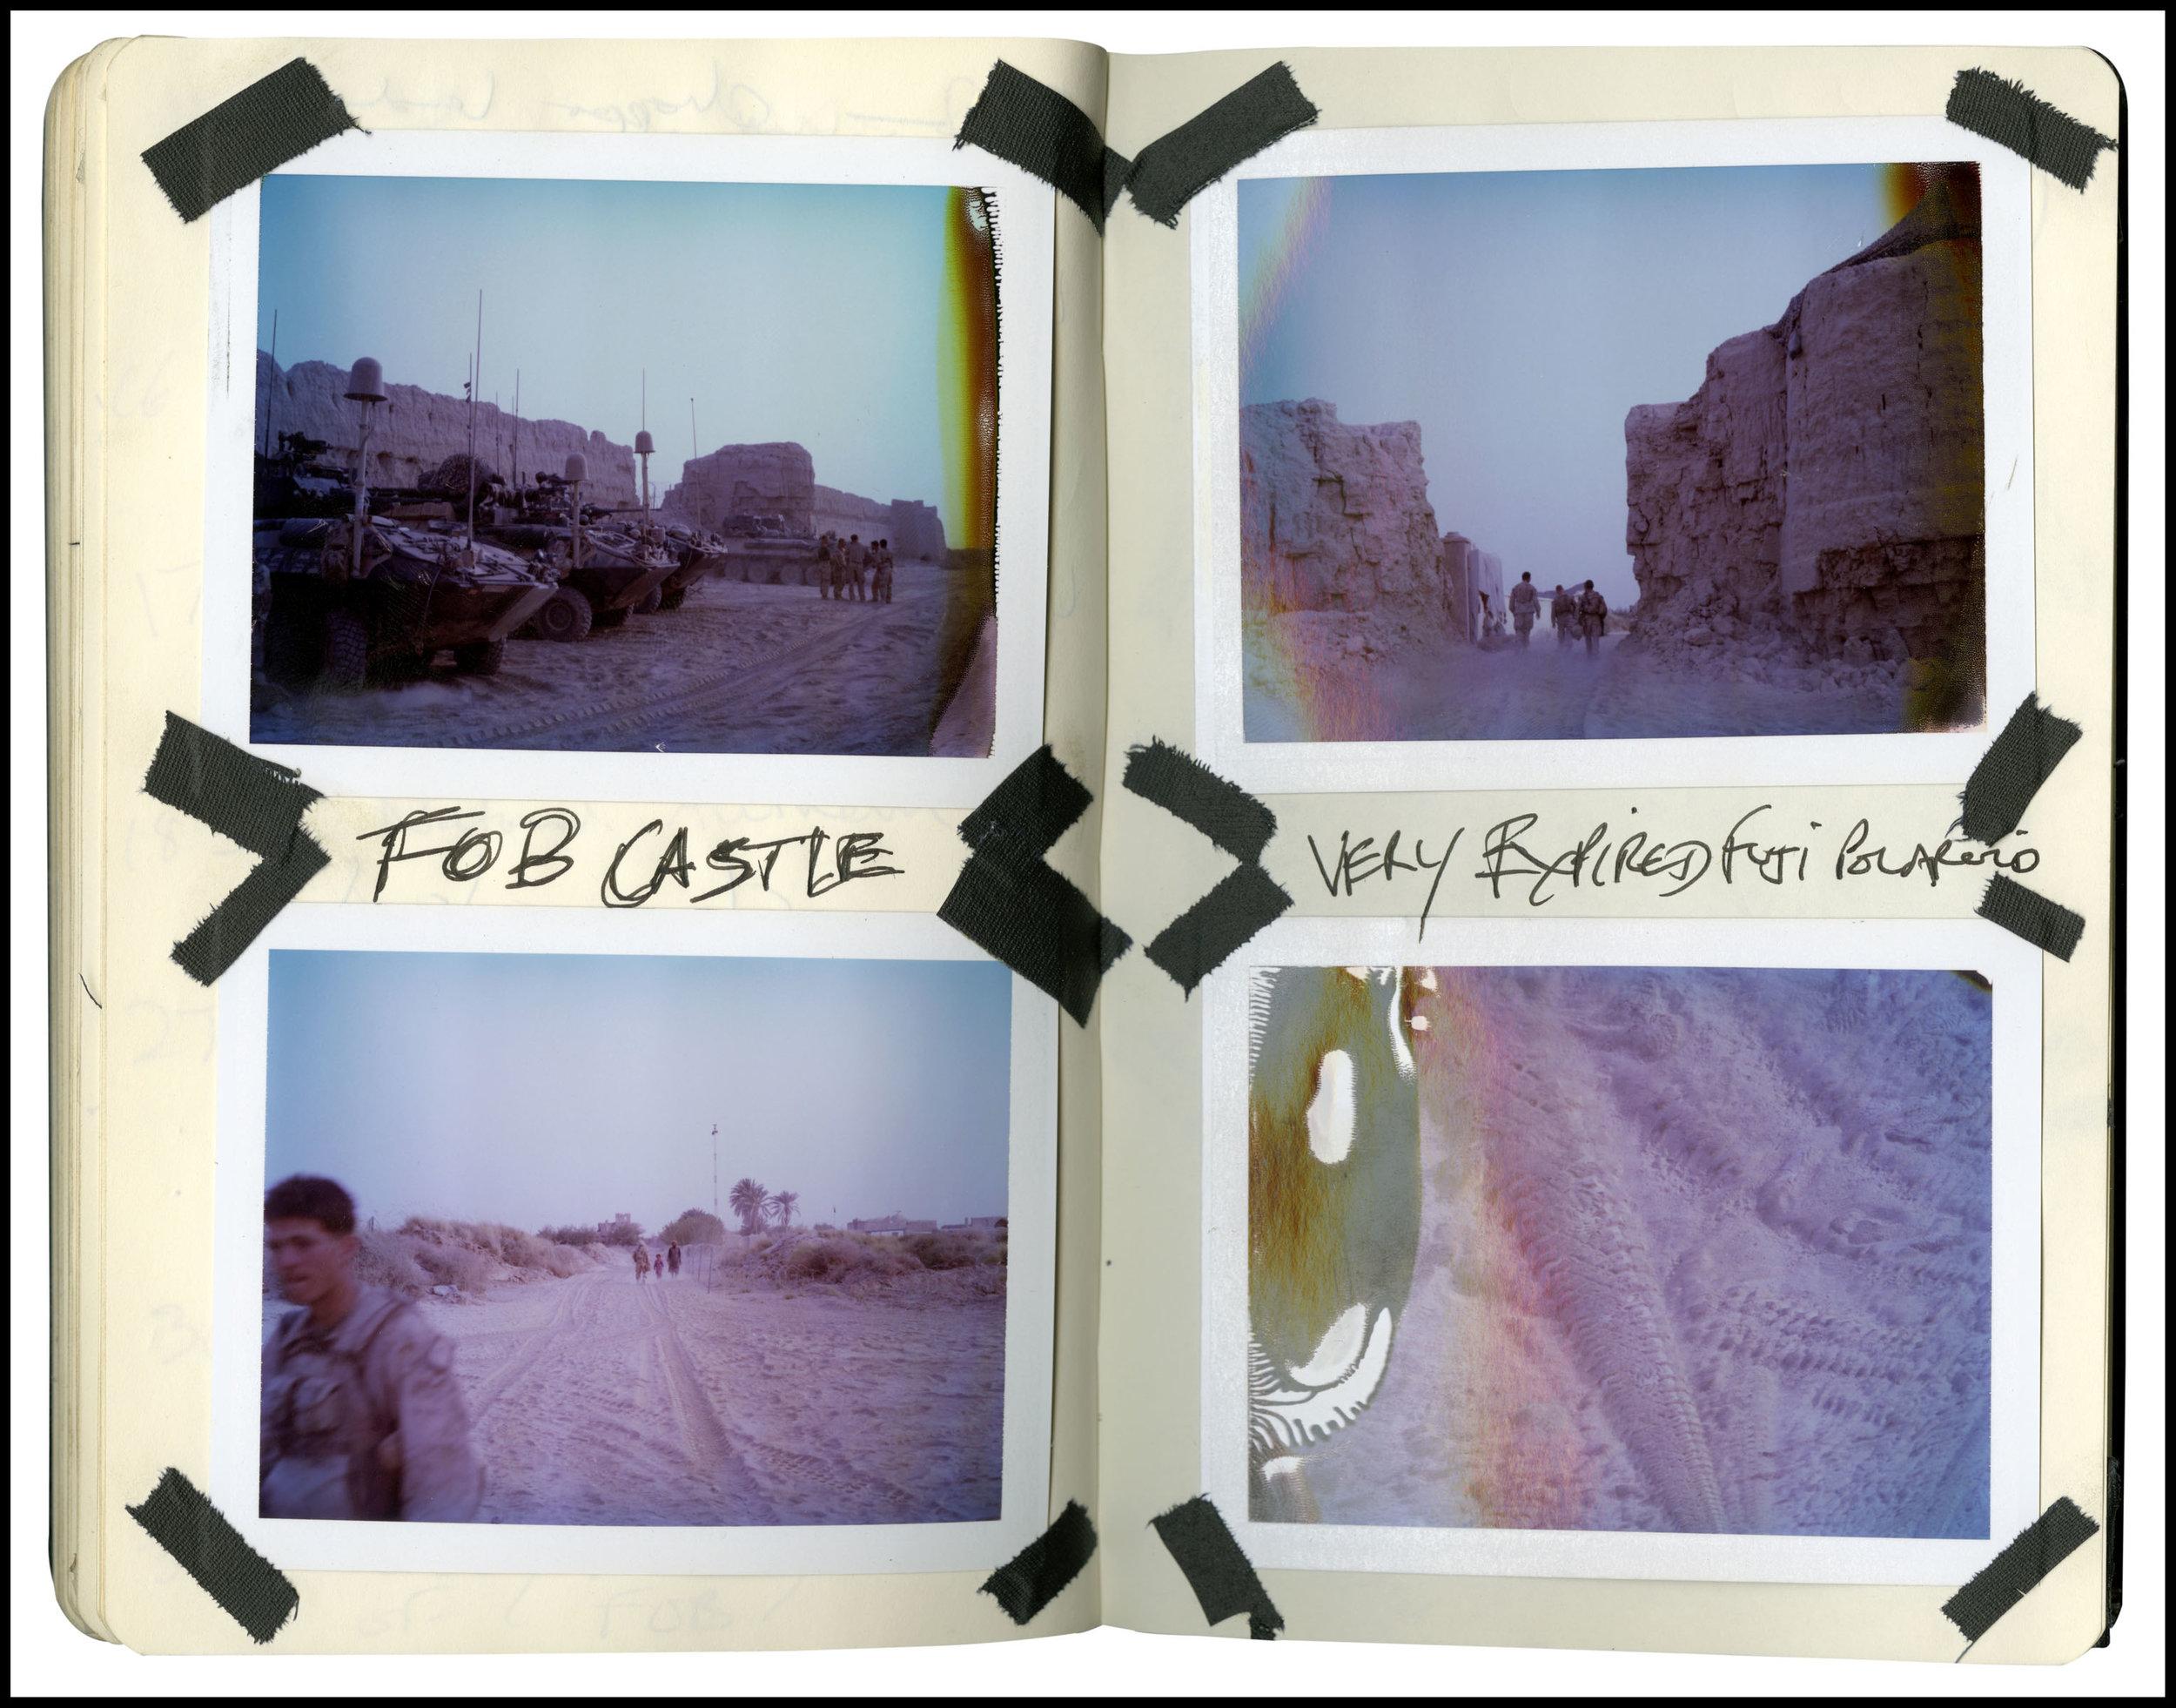 Afghanistan Diary 2008 - 2009